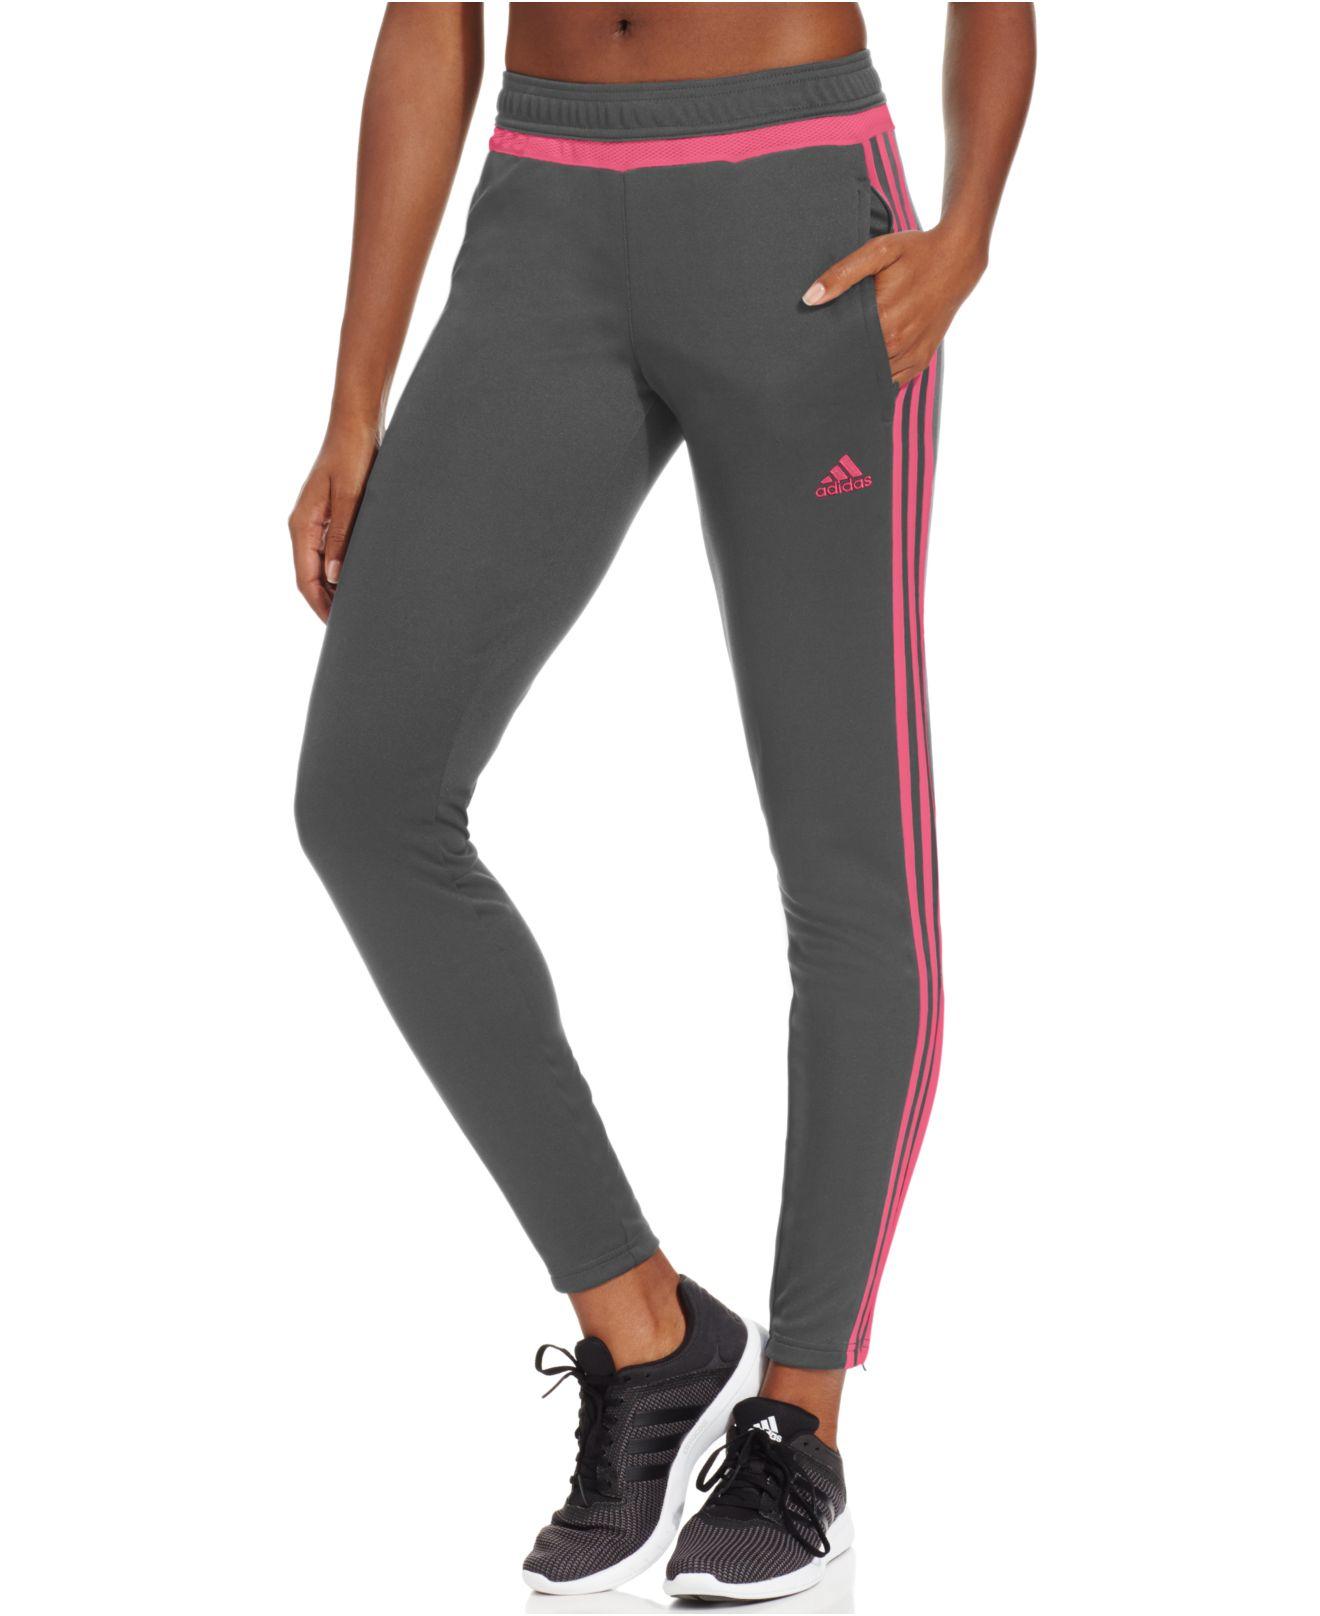 pink adidas pants cheap 09e27 1cf73